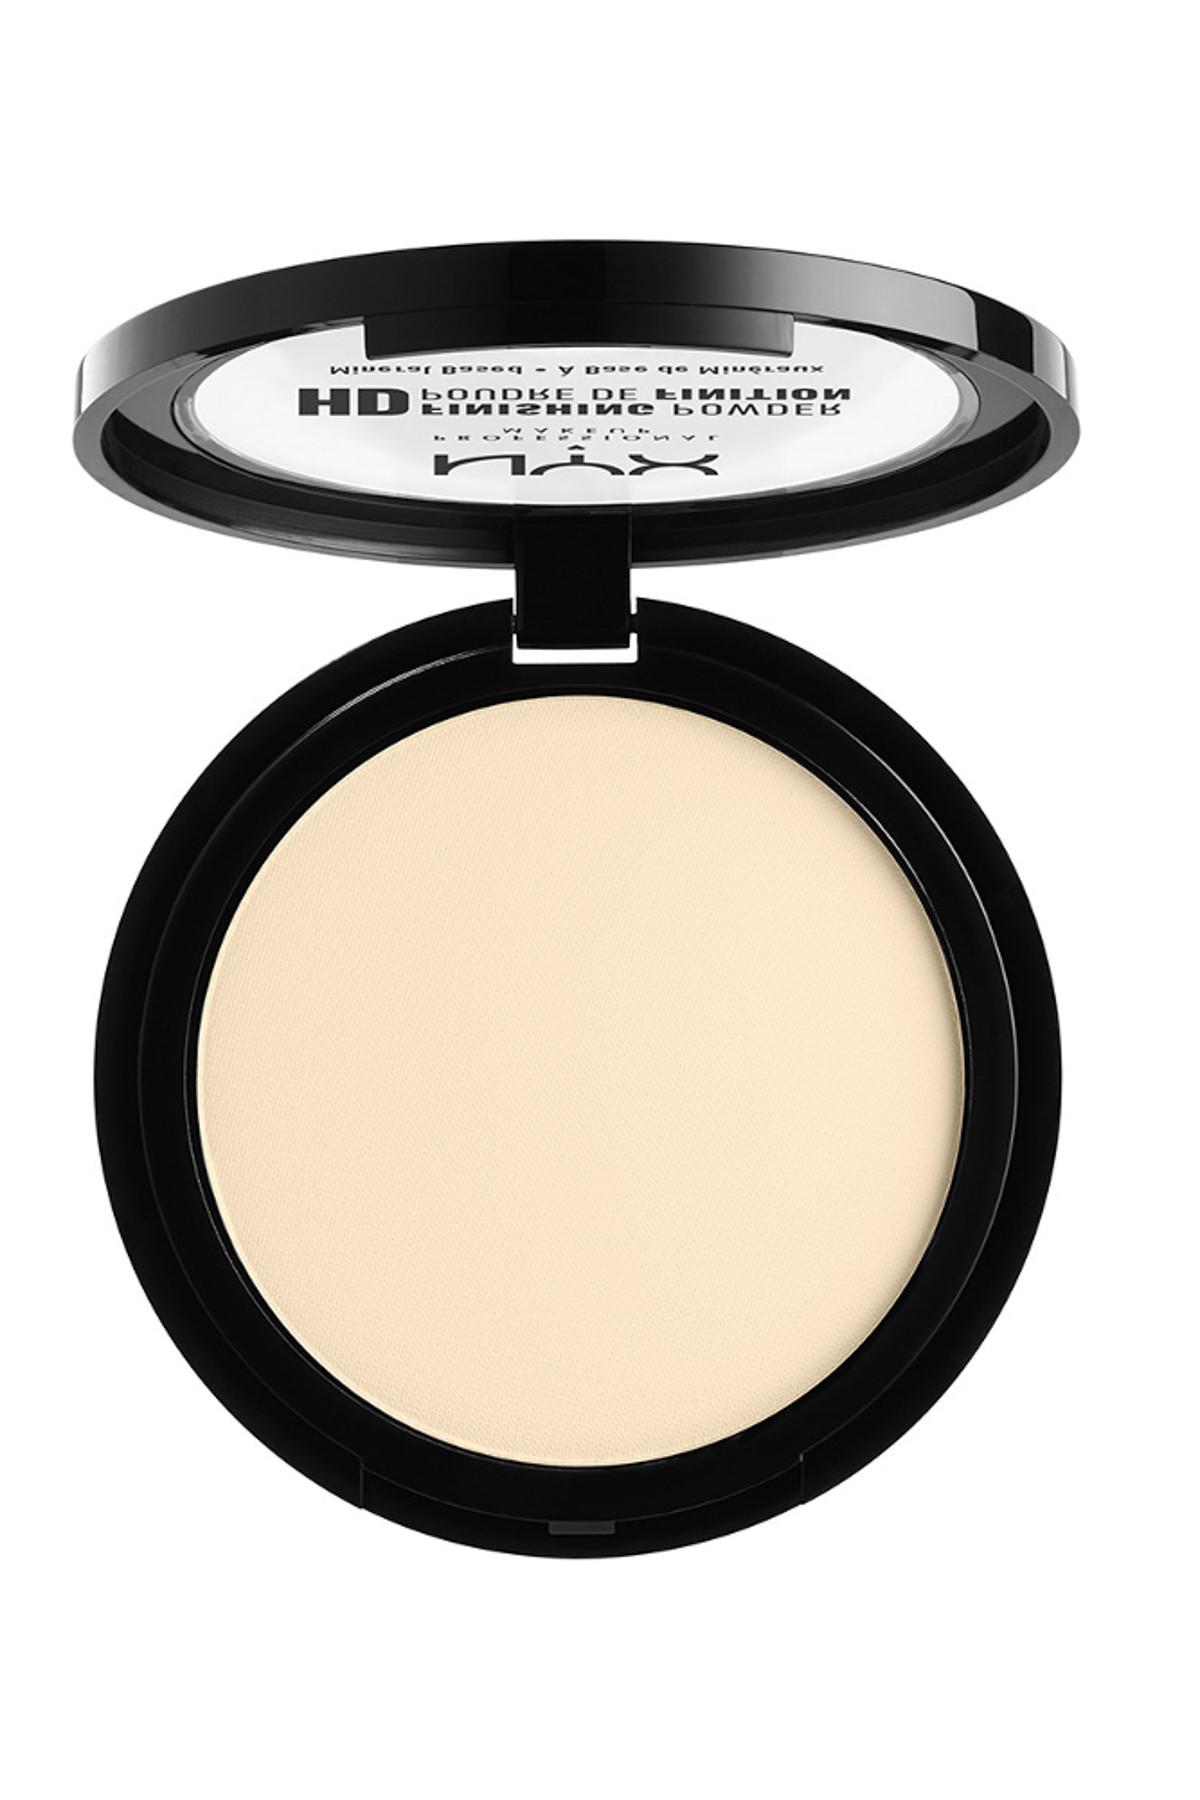 NYX Professional Makeup Sabitleyici Pudra - High Definition Finishing Powder Banana 17 g 800897834678 2